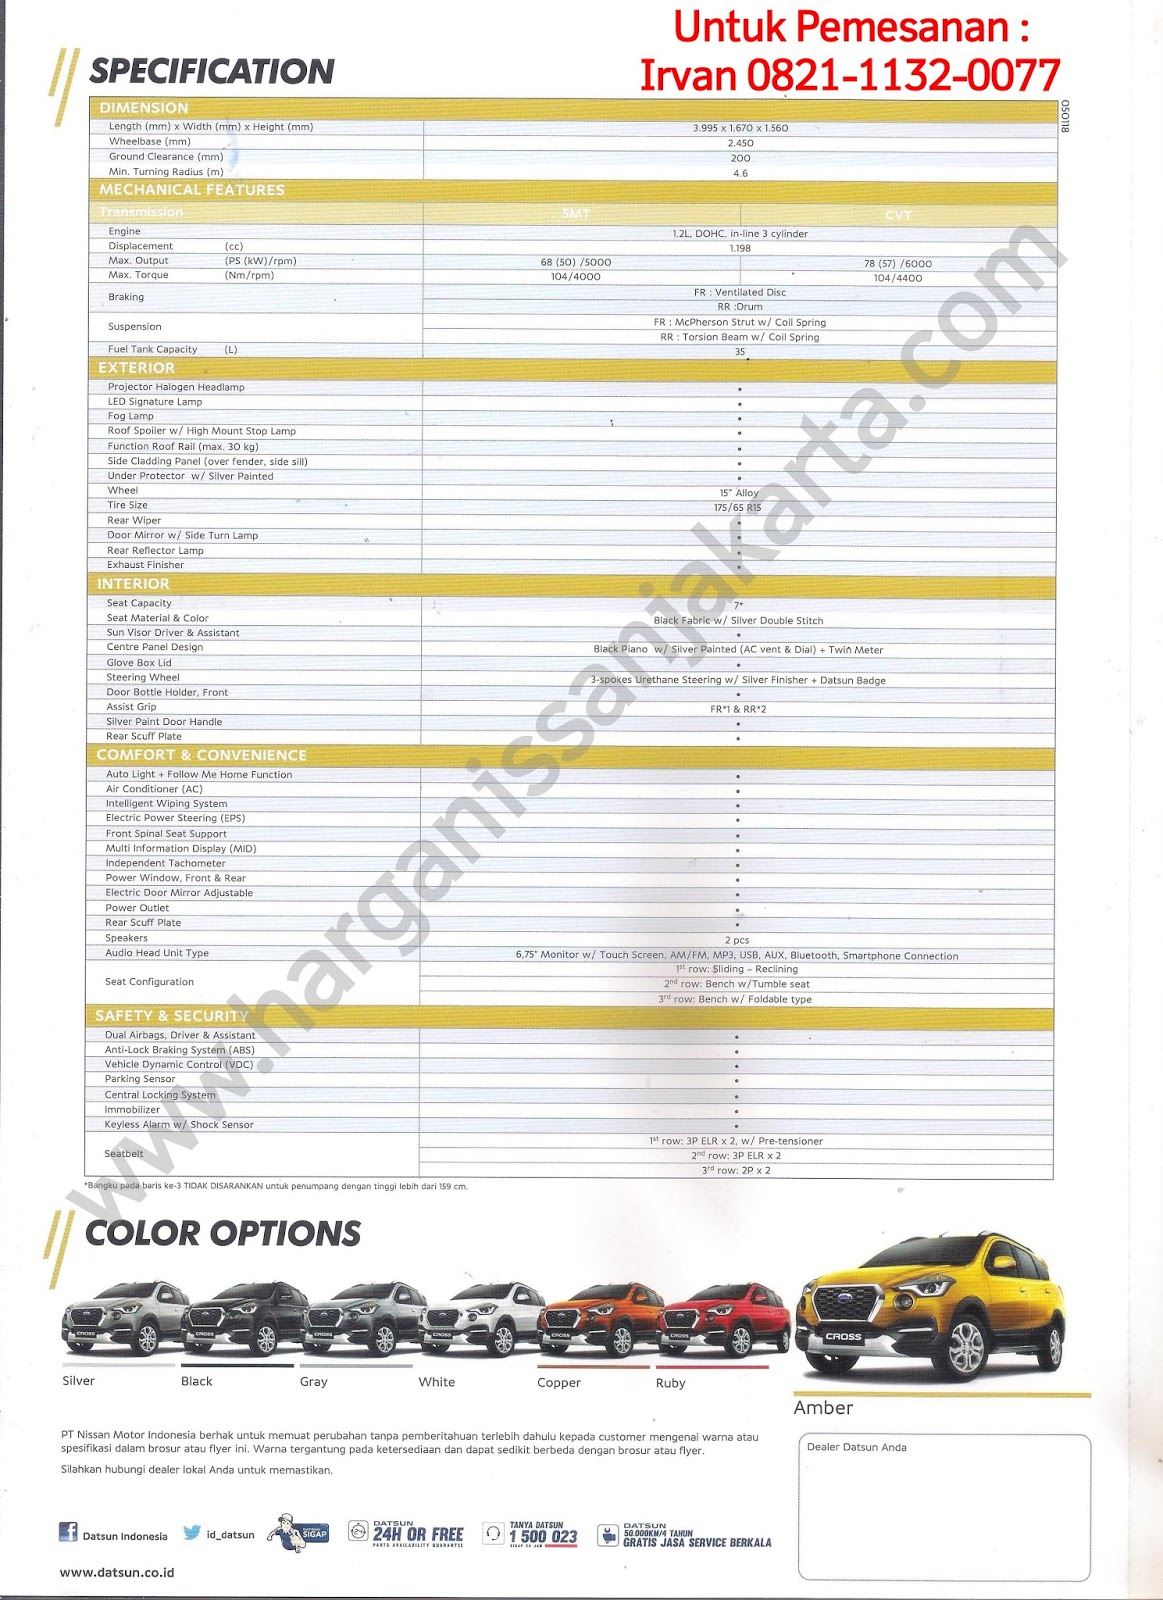 Brosur Katalog Datsun Cross 2018